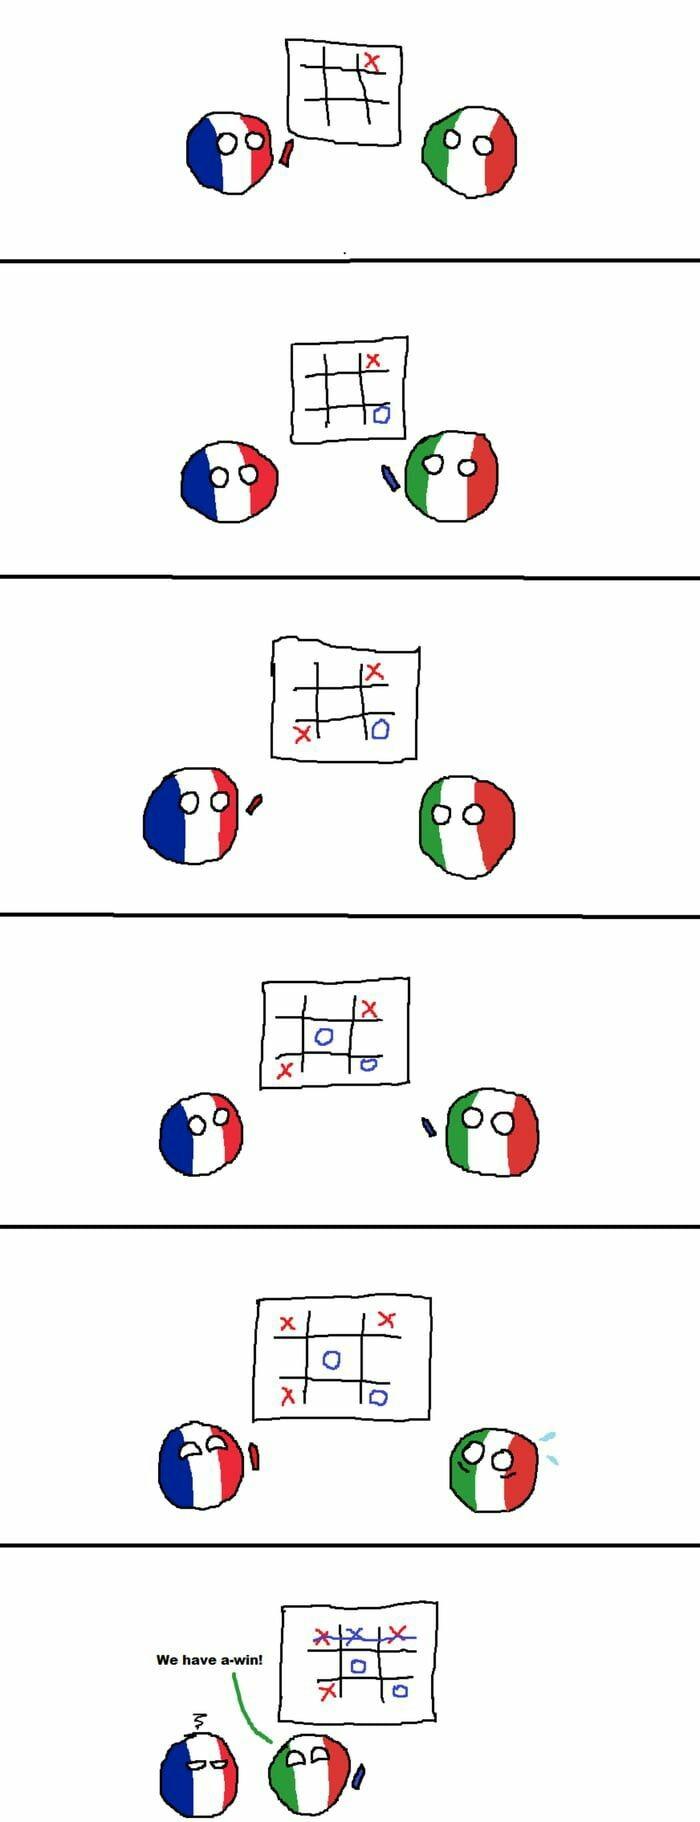 Momento Guerra Mundial - meme